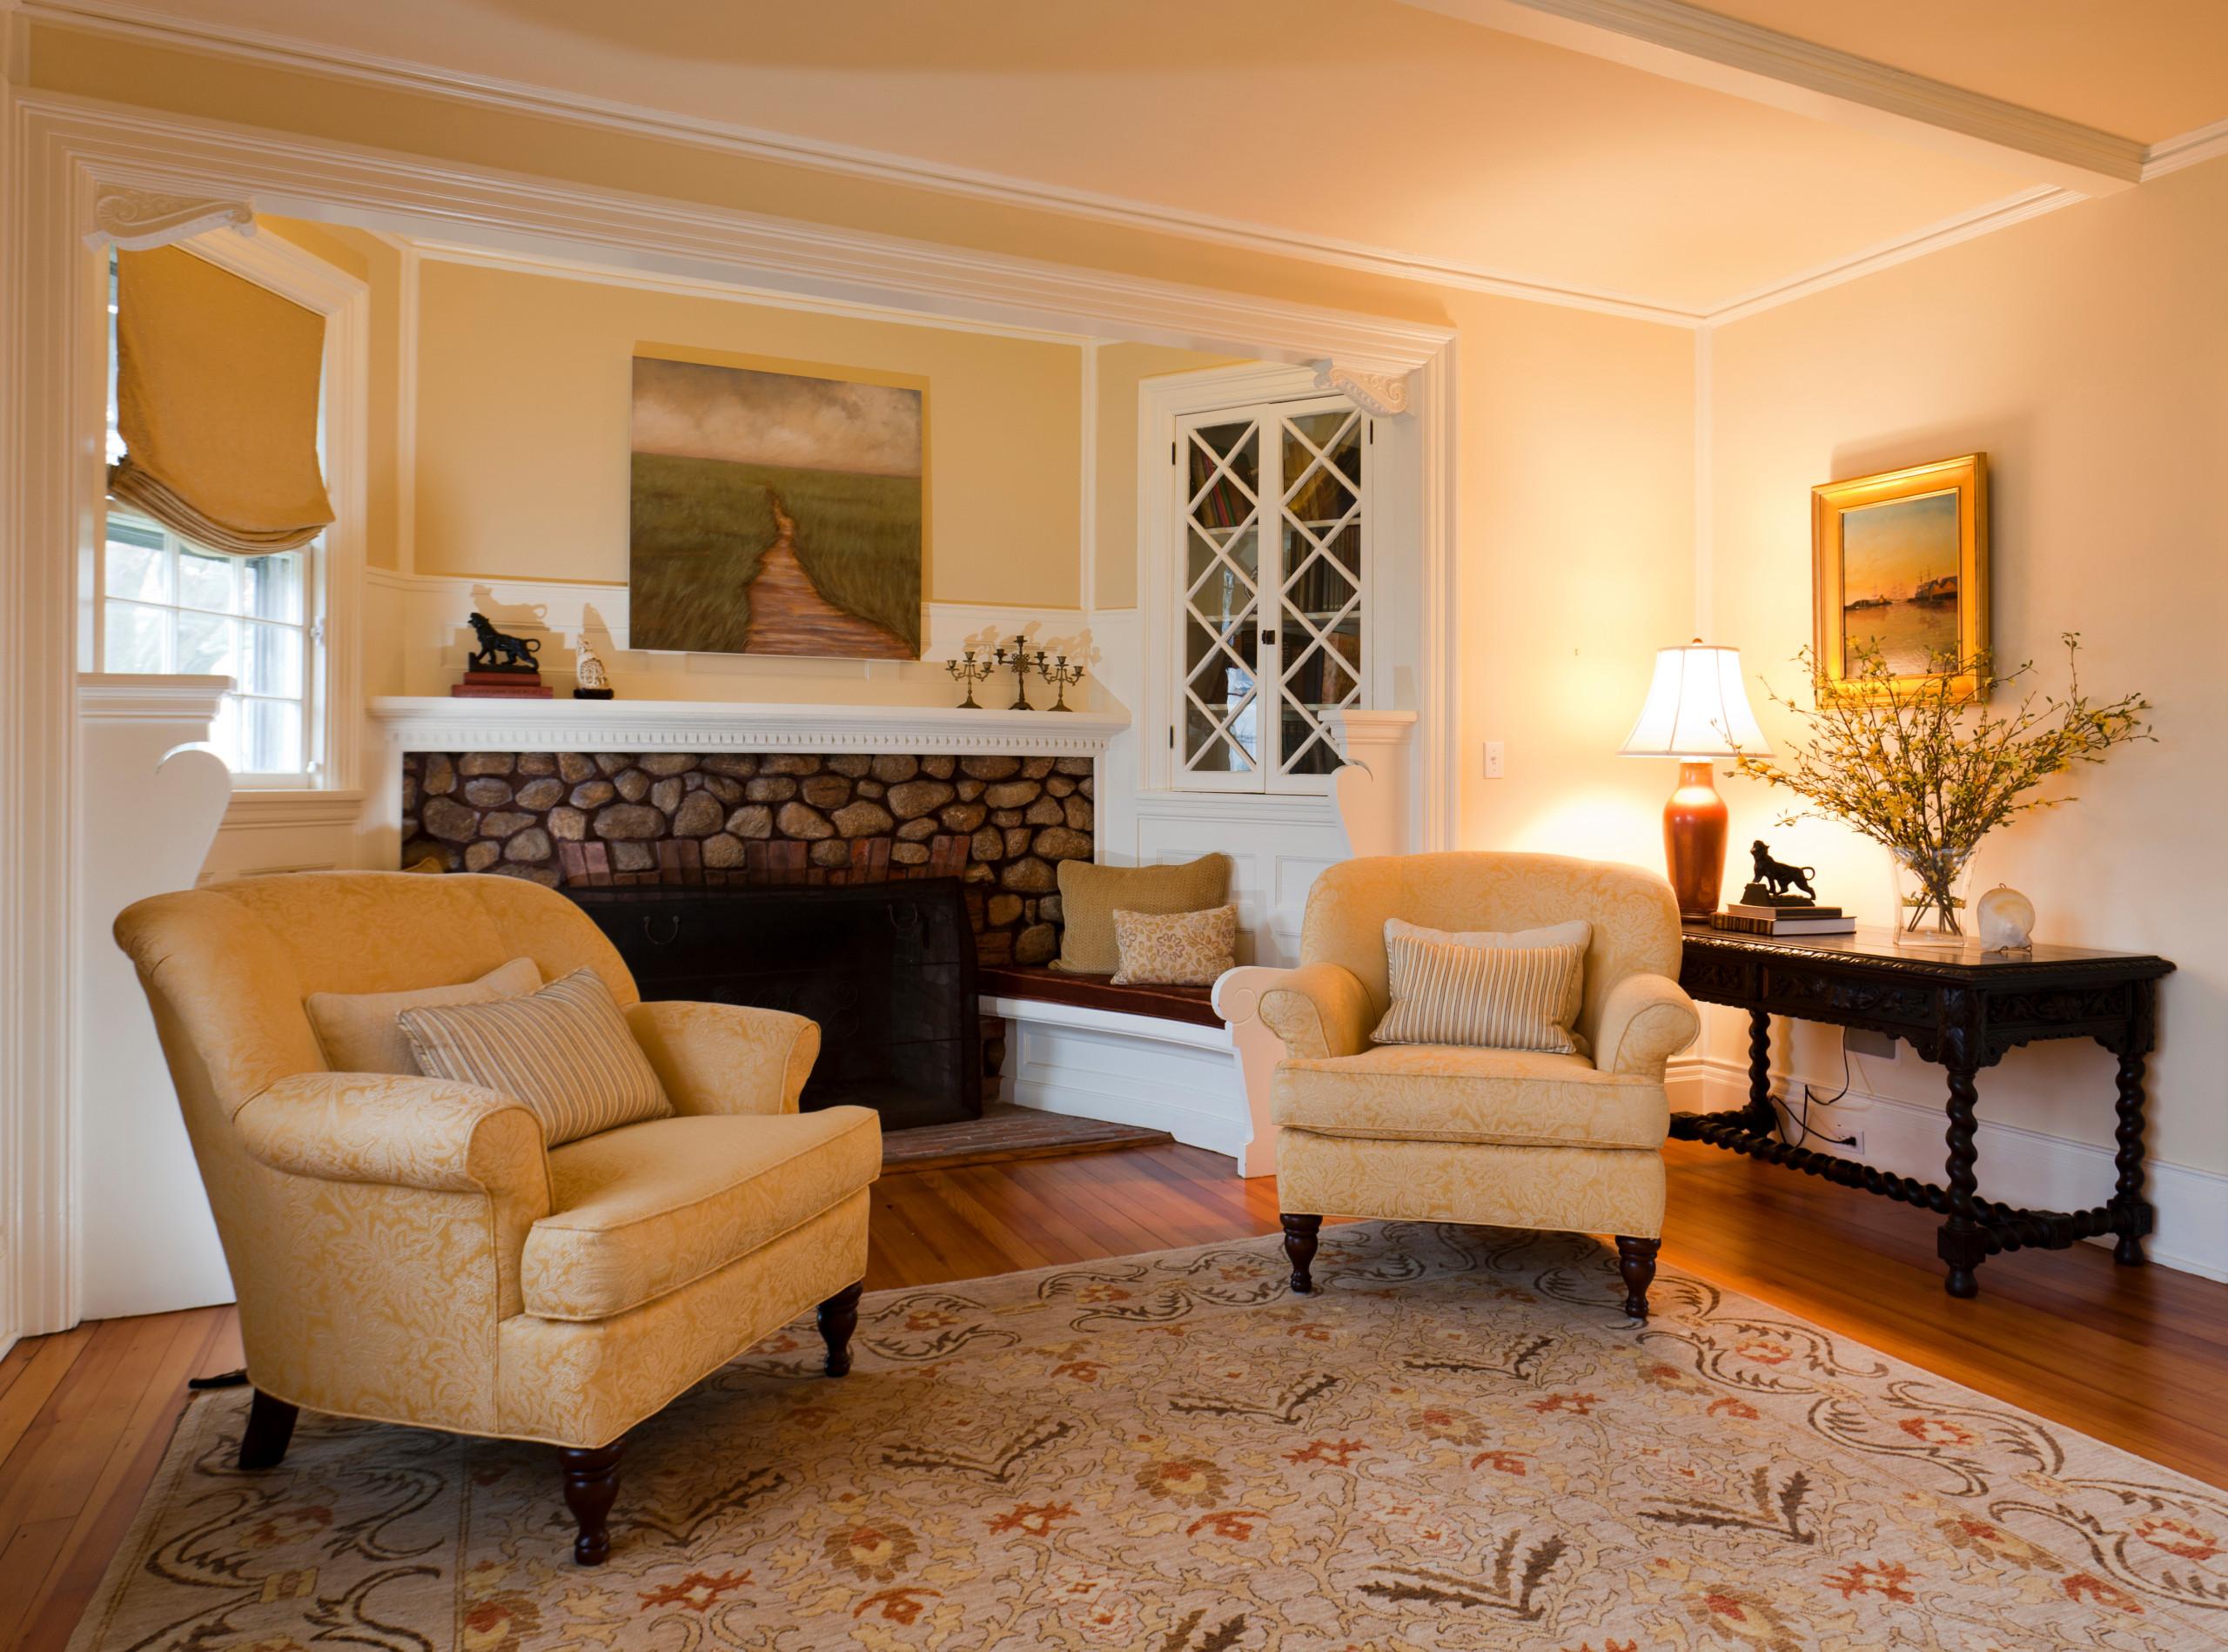 Living Room in Historic 1890's Seaside Home